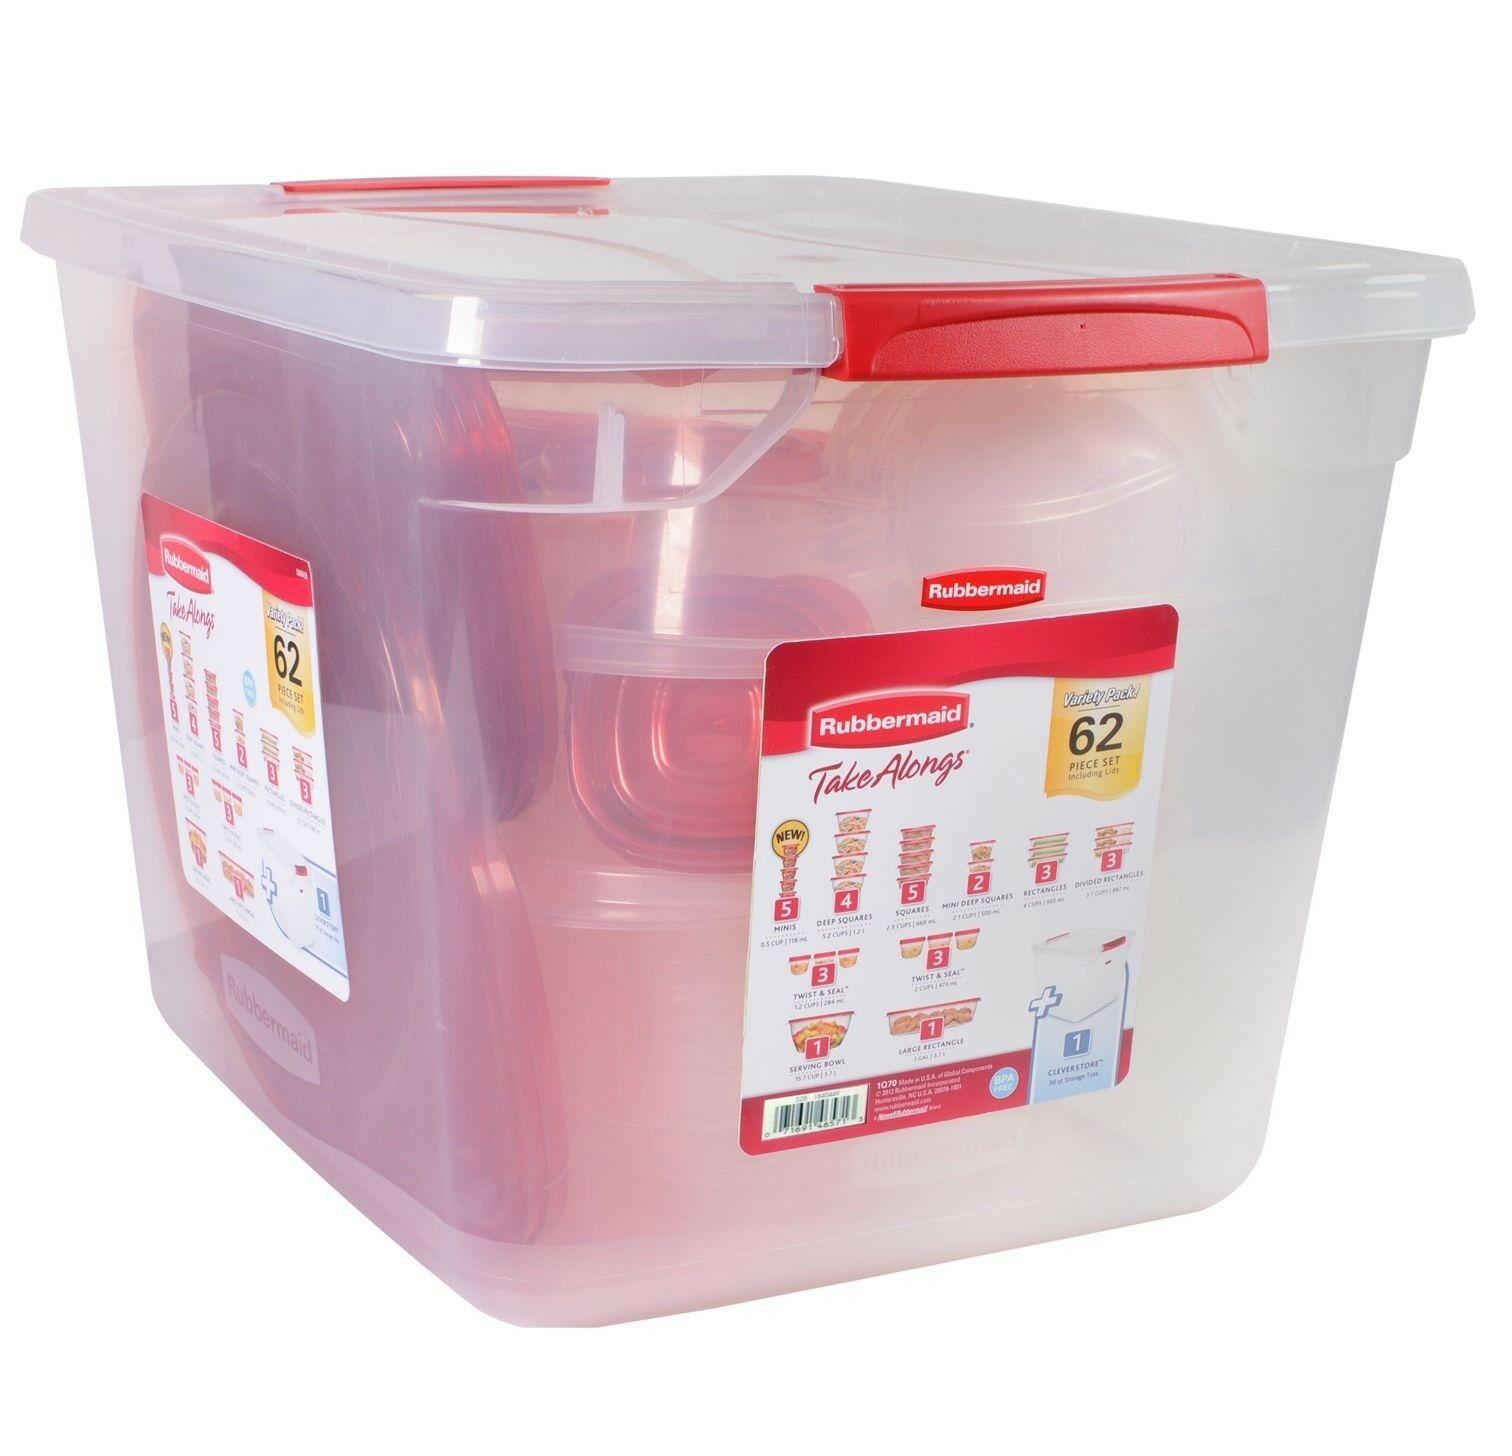 Rubbermaid 62-Piece TakeAlongs Food Storage Set Brand New 1